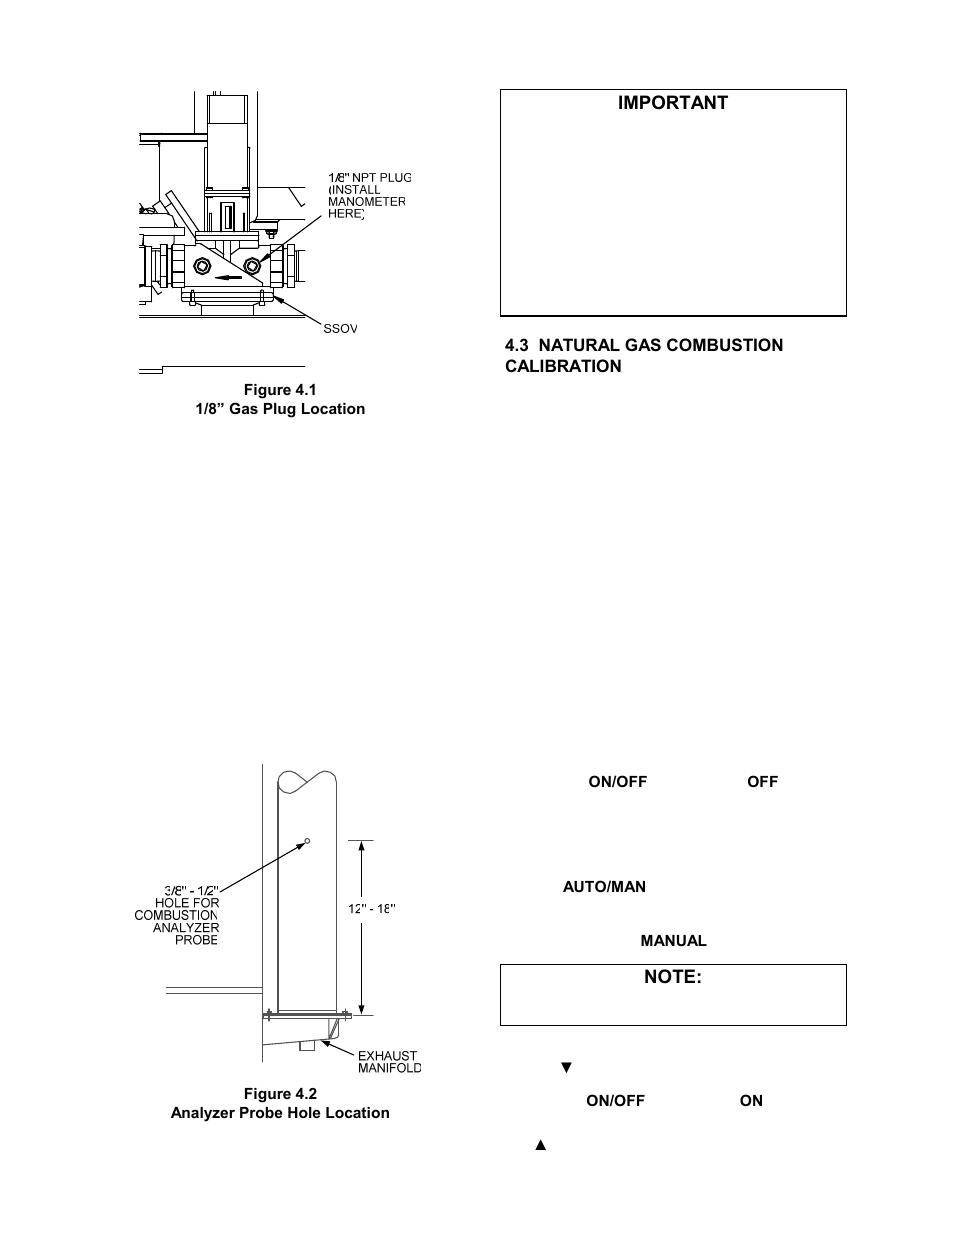 3 preparing the flue vent probe hole 3 combustion calibration rh manualsdir com